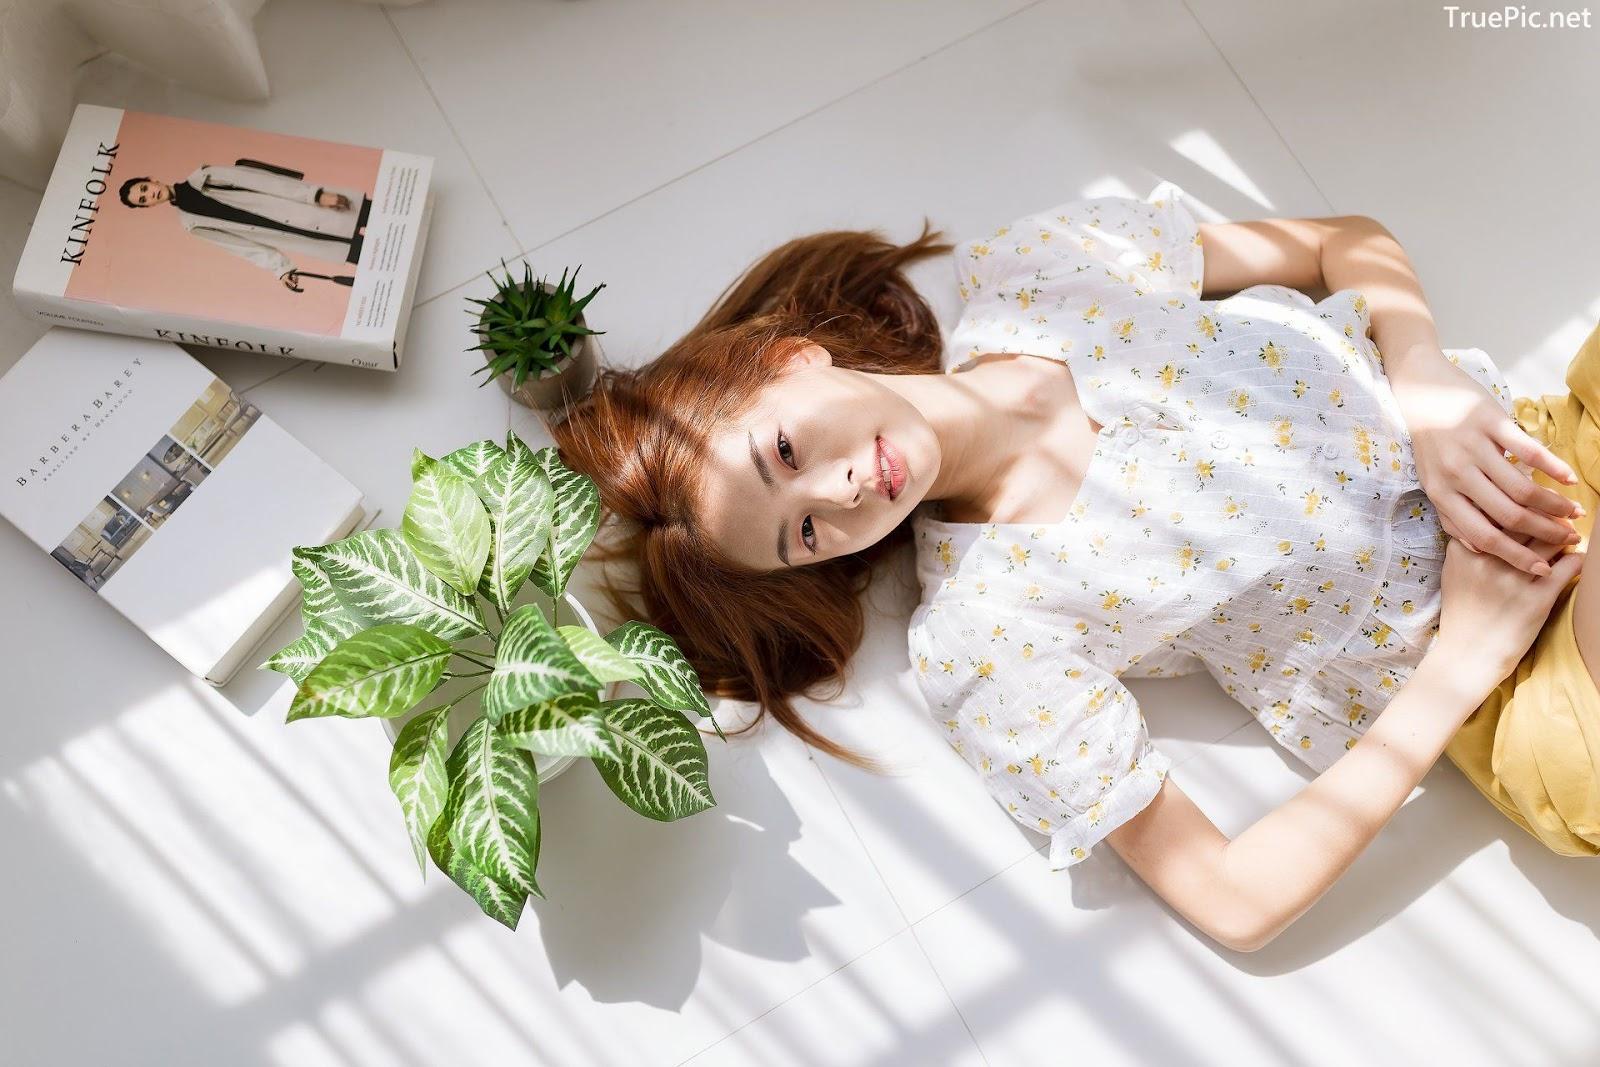 Image-Thailand-Angel-Model-Nut-Theerarat-White-Room-TruePic.net- Picture-8